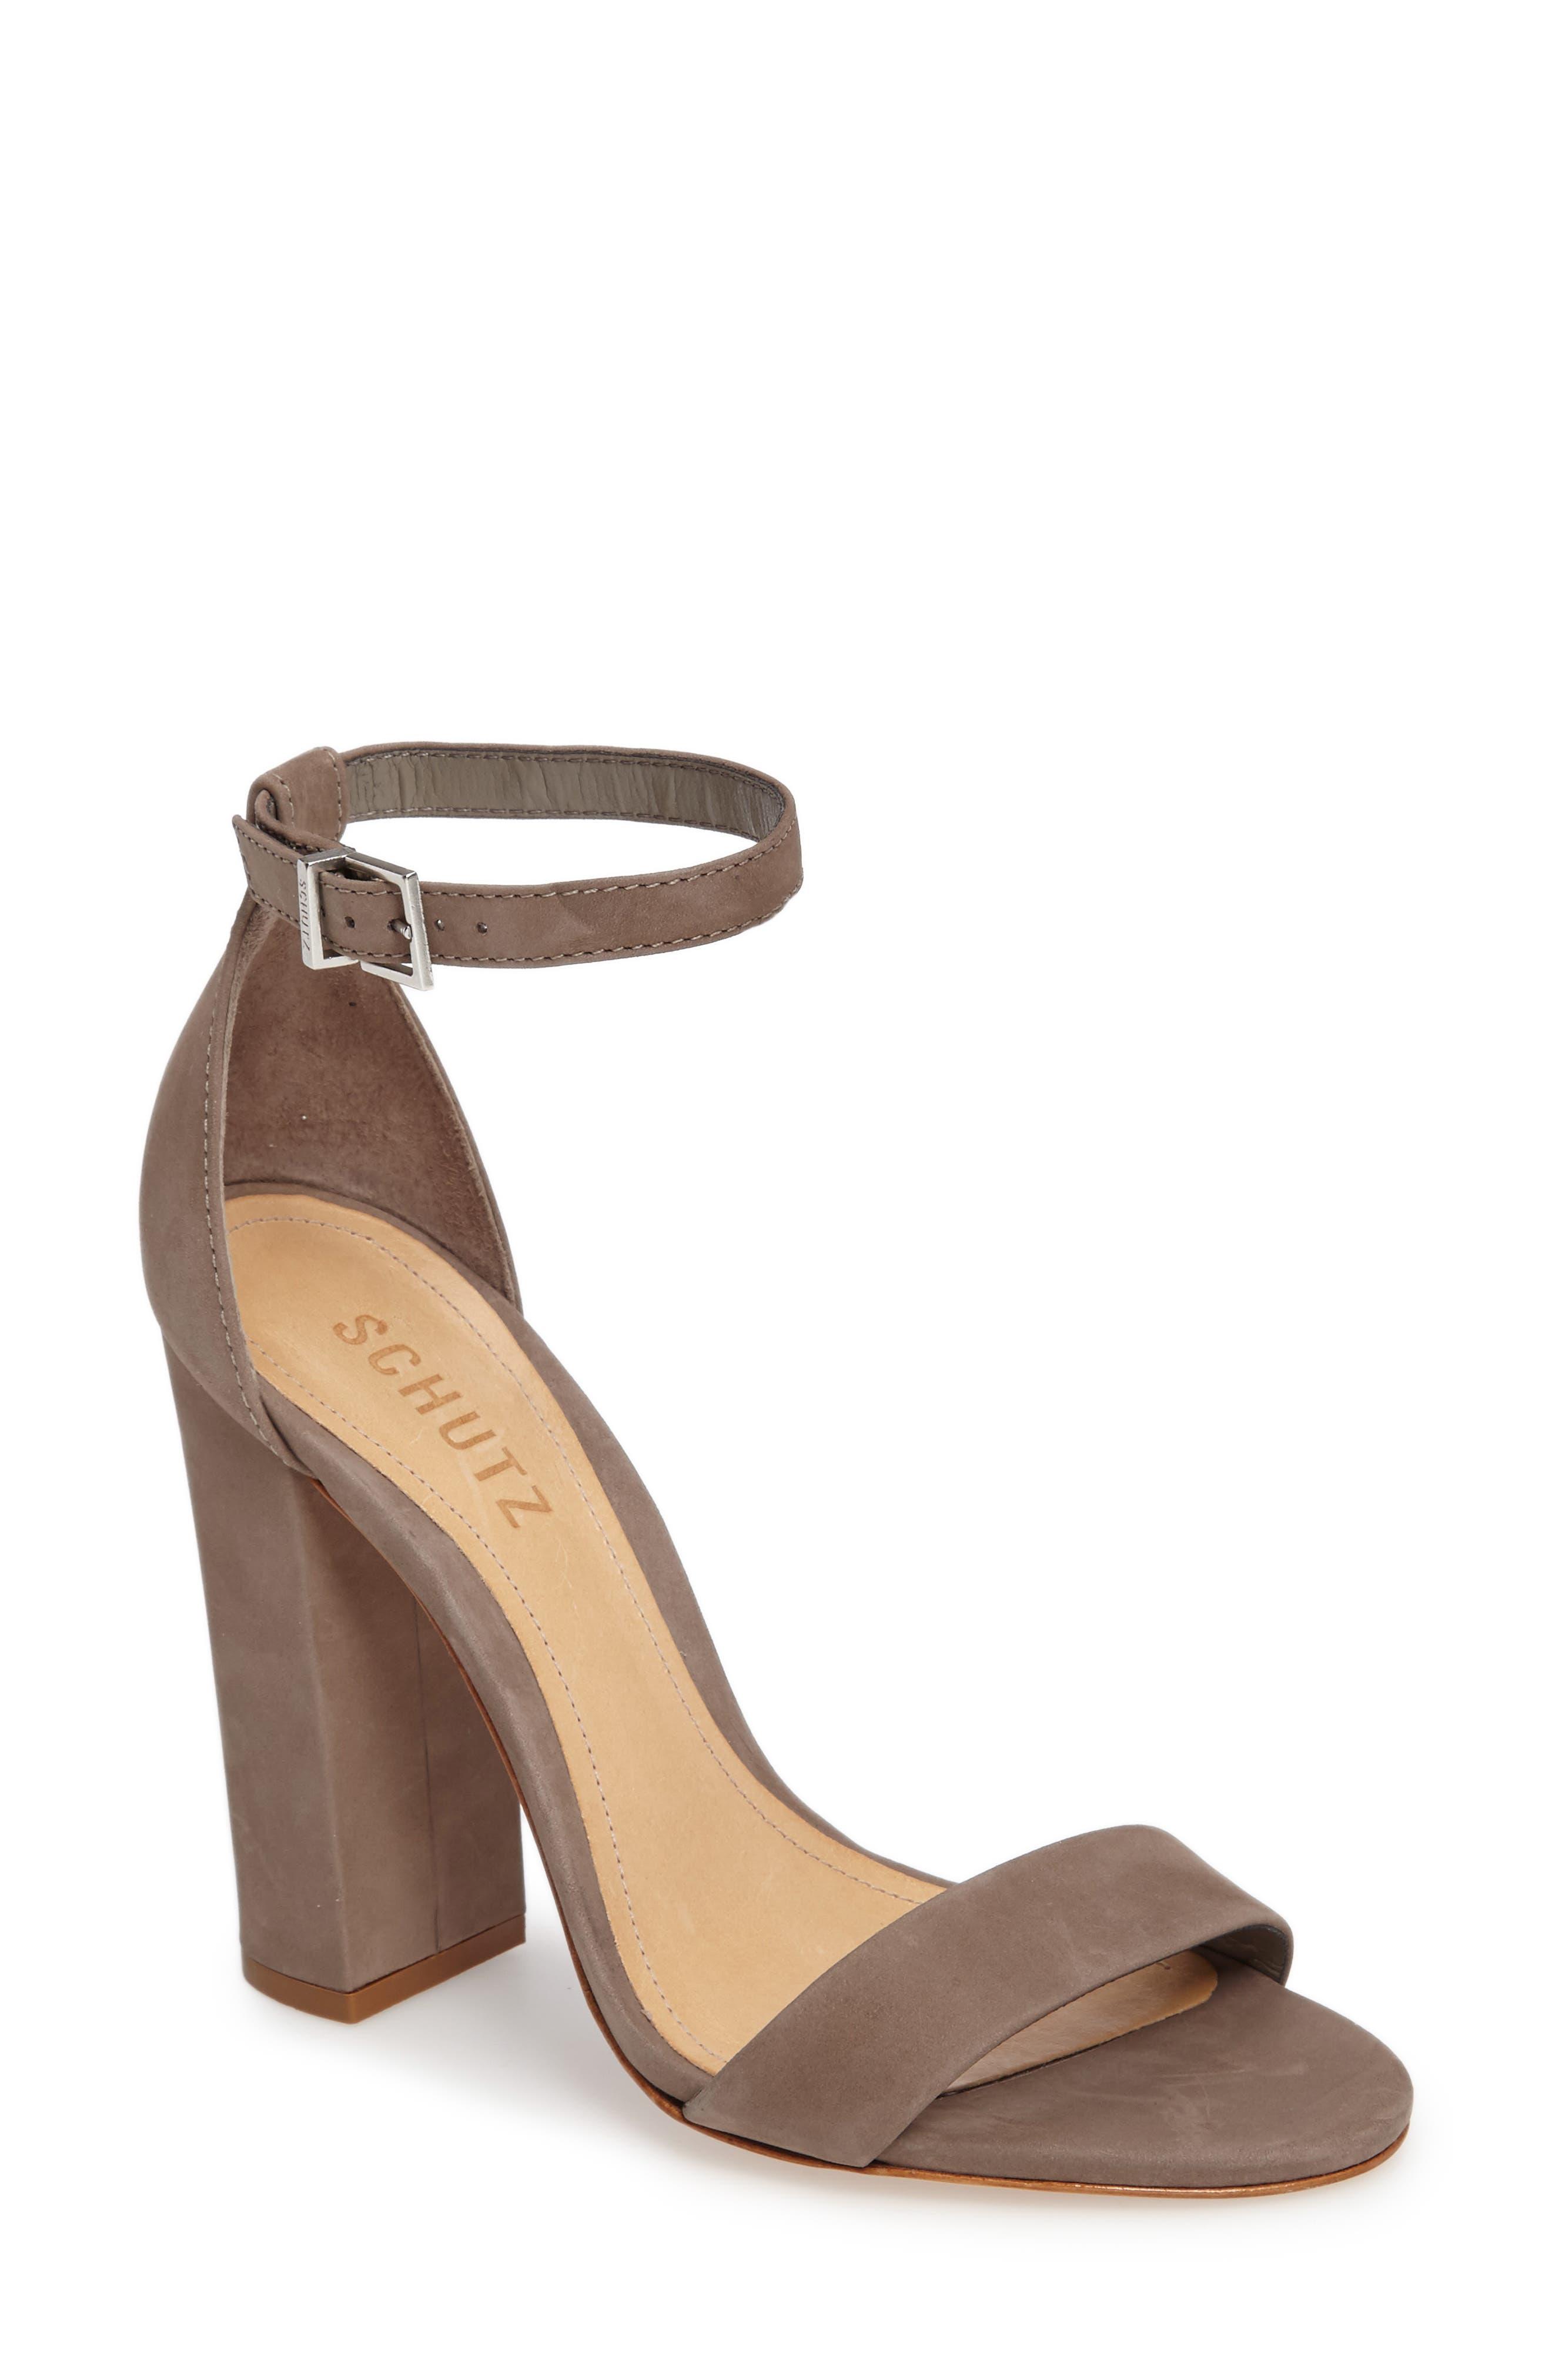 Enida Sandal,                             Main thumbnail 1, color,                             Mouse Nubuck Leather